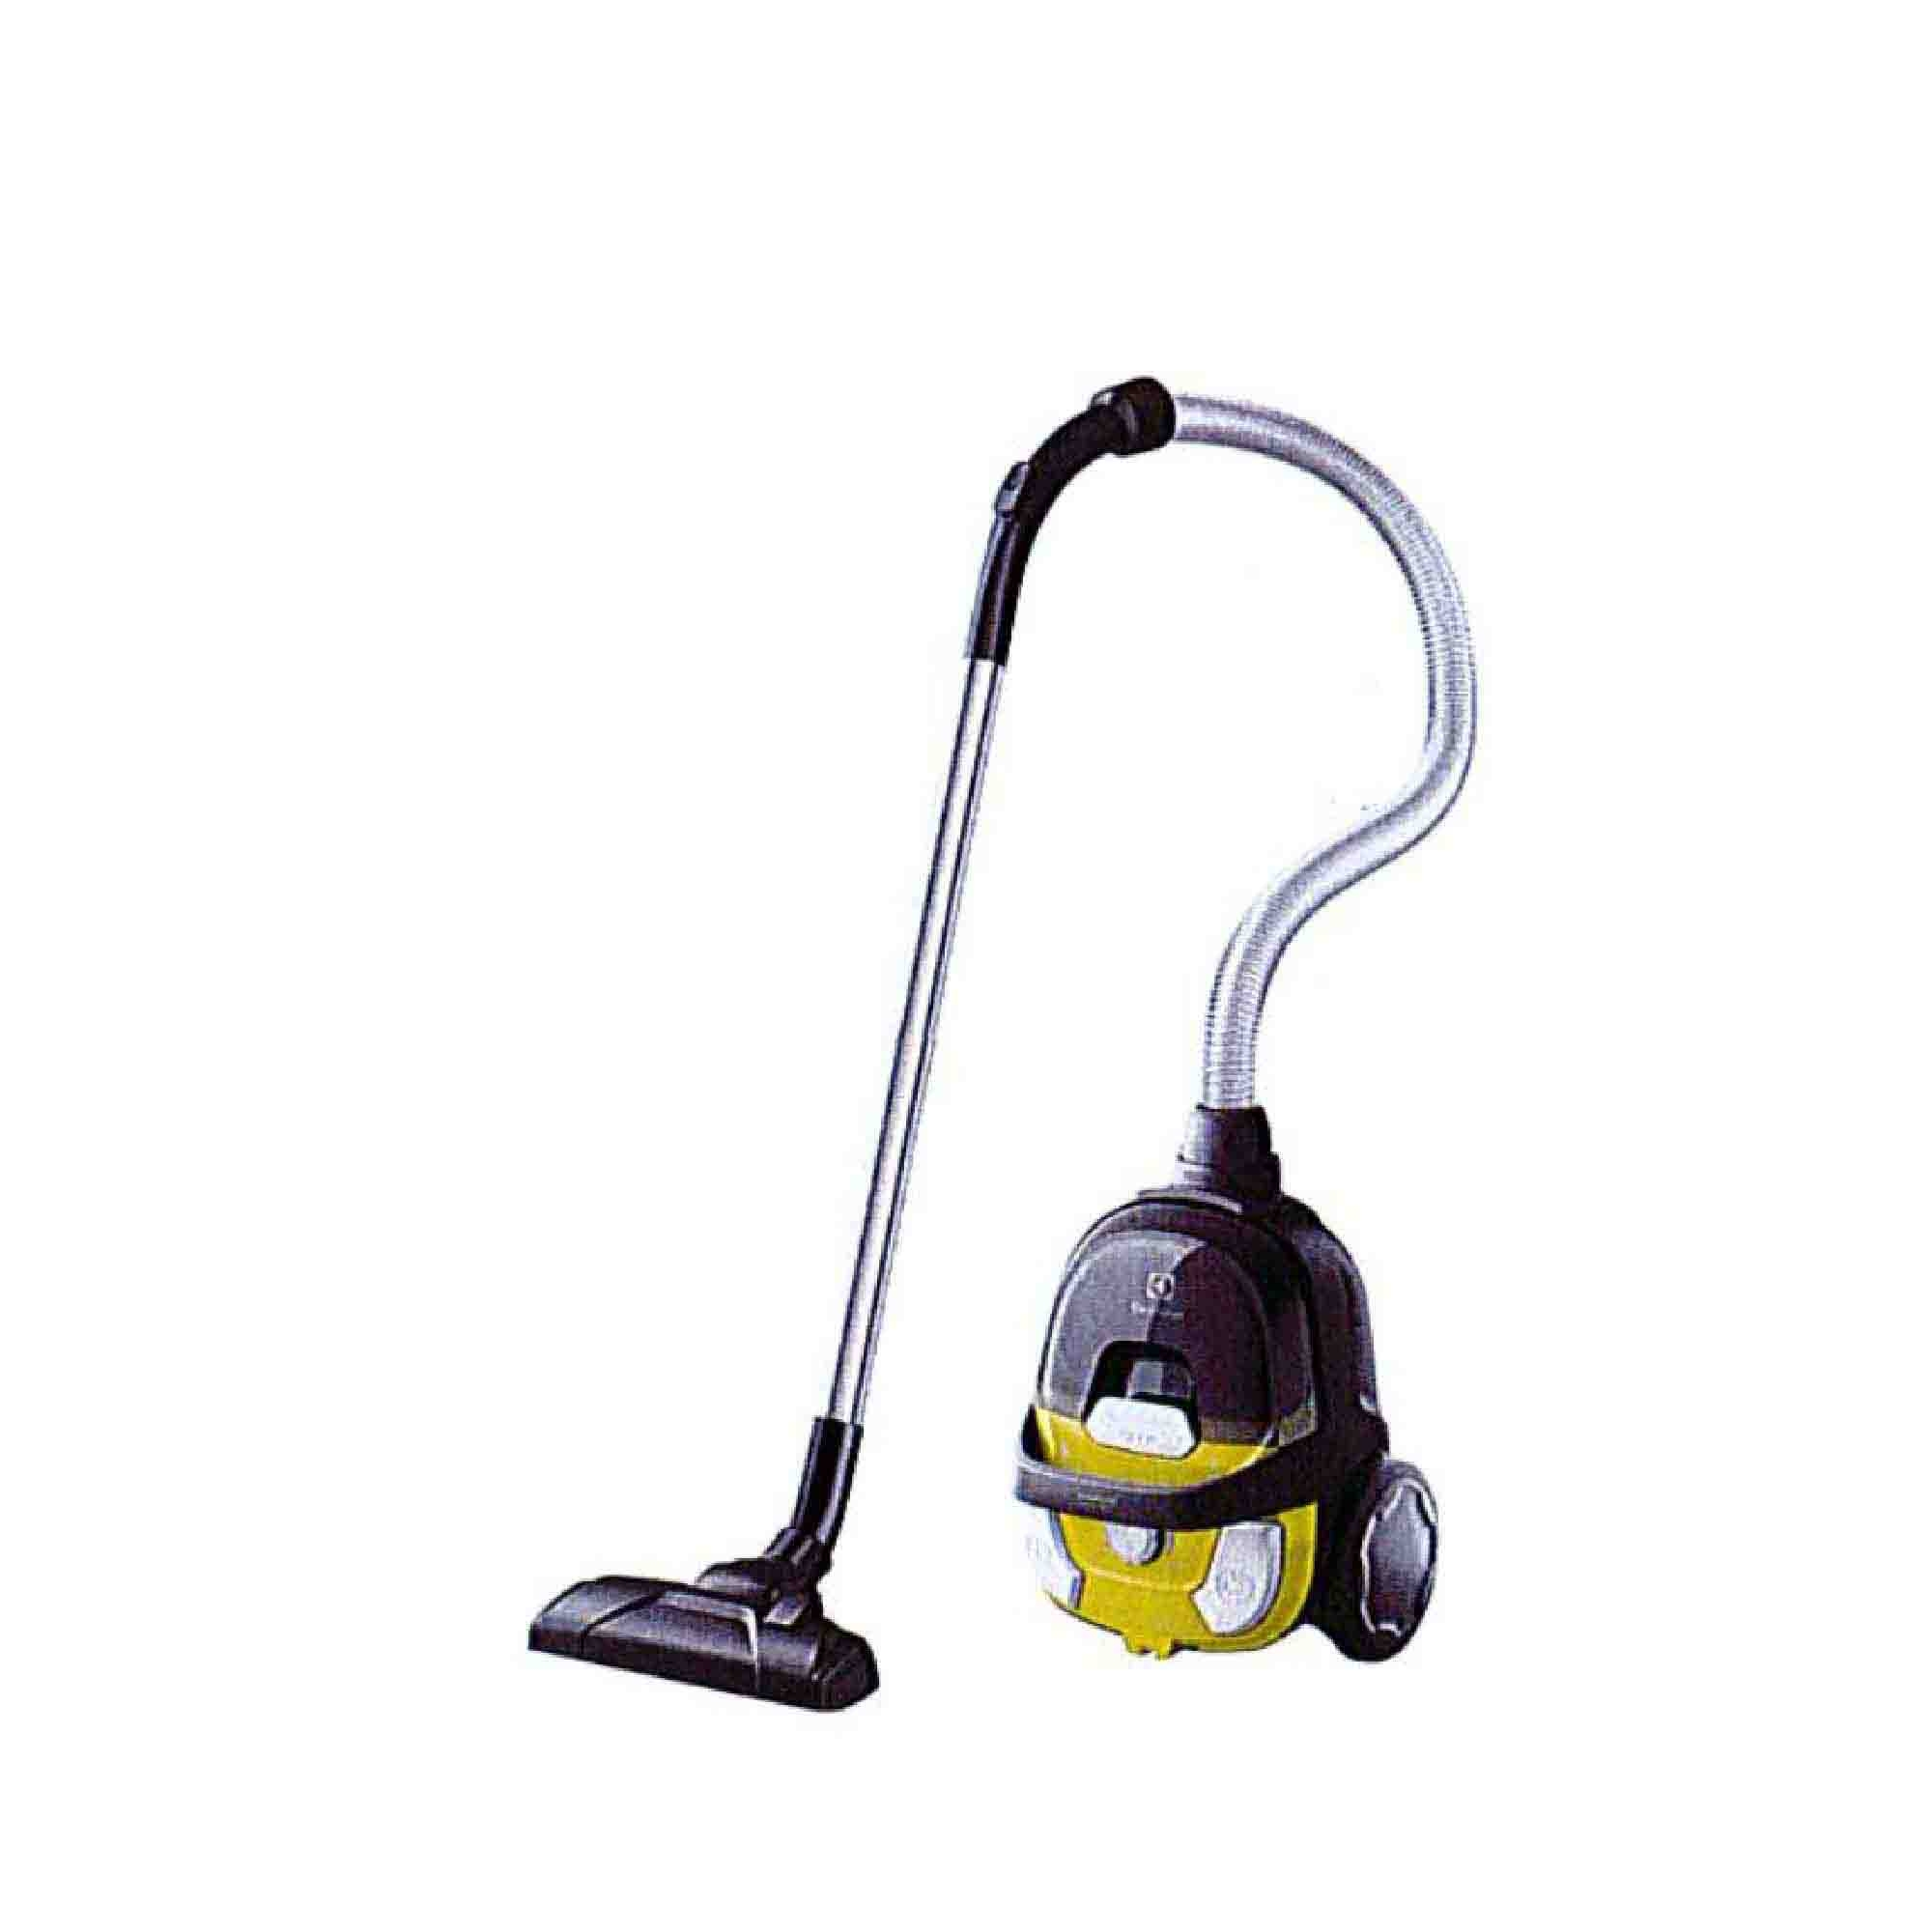 Electrolux Carpet Cleaner Brushes Carpet Vidalondon